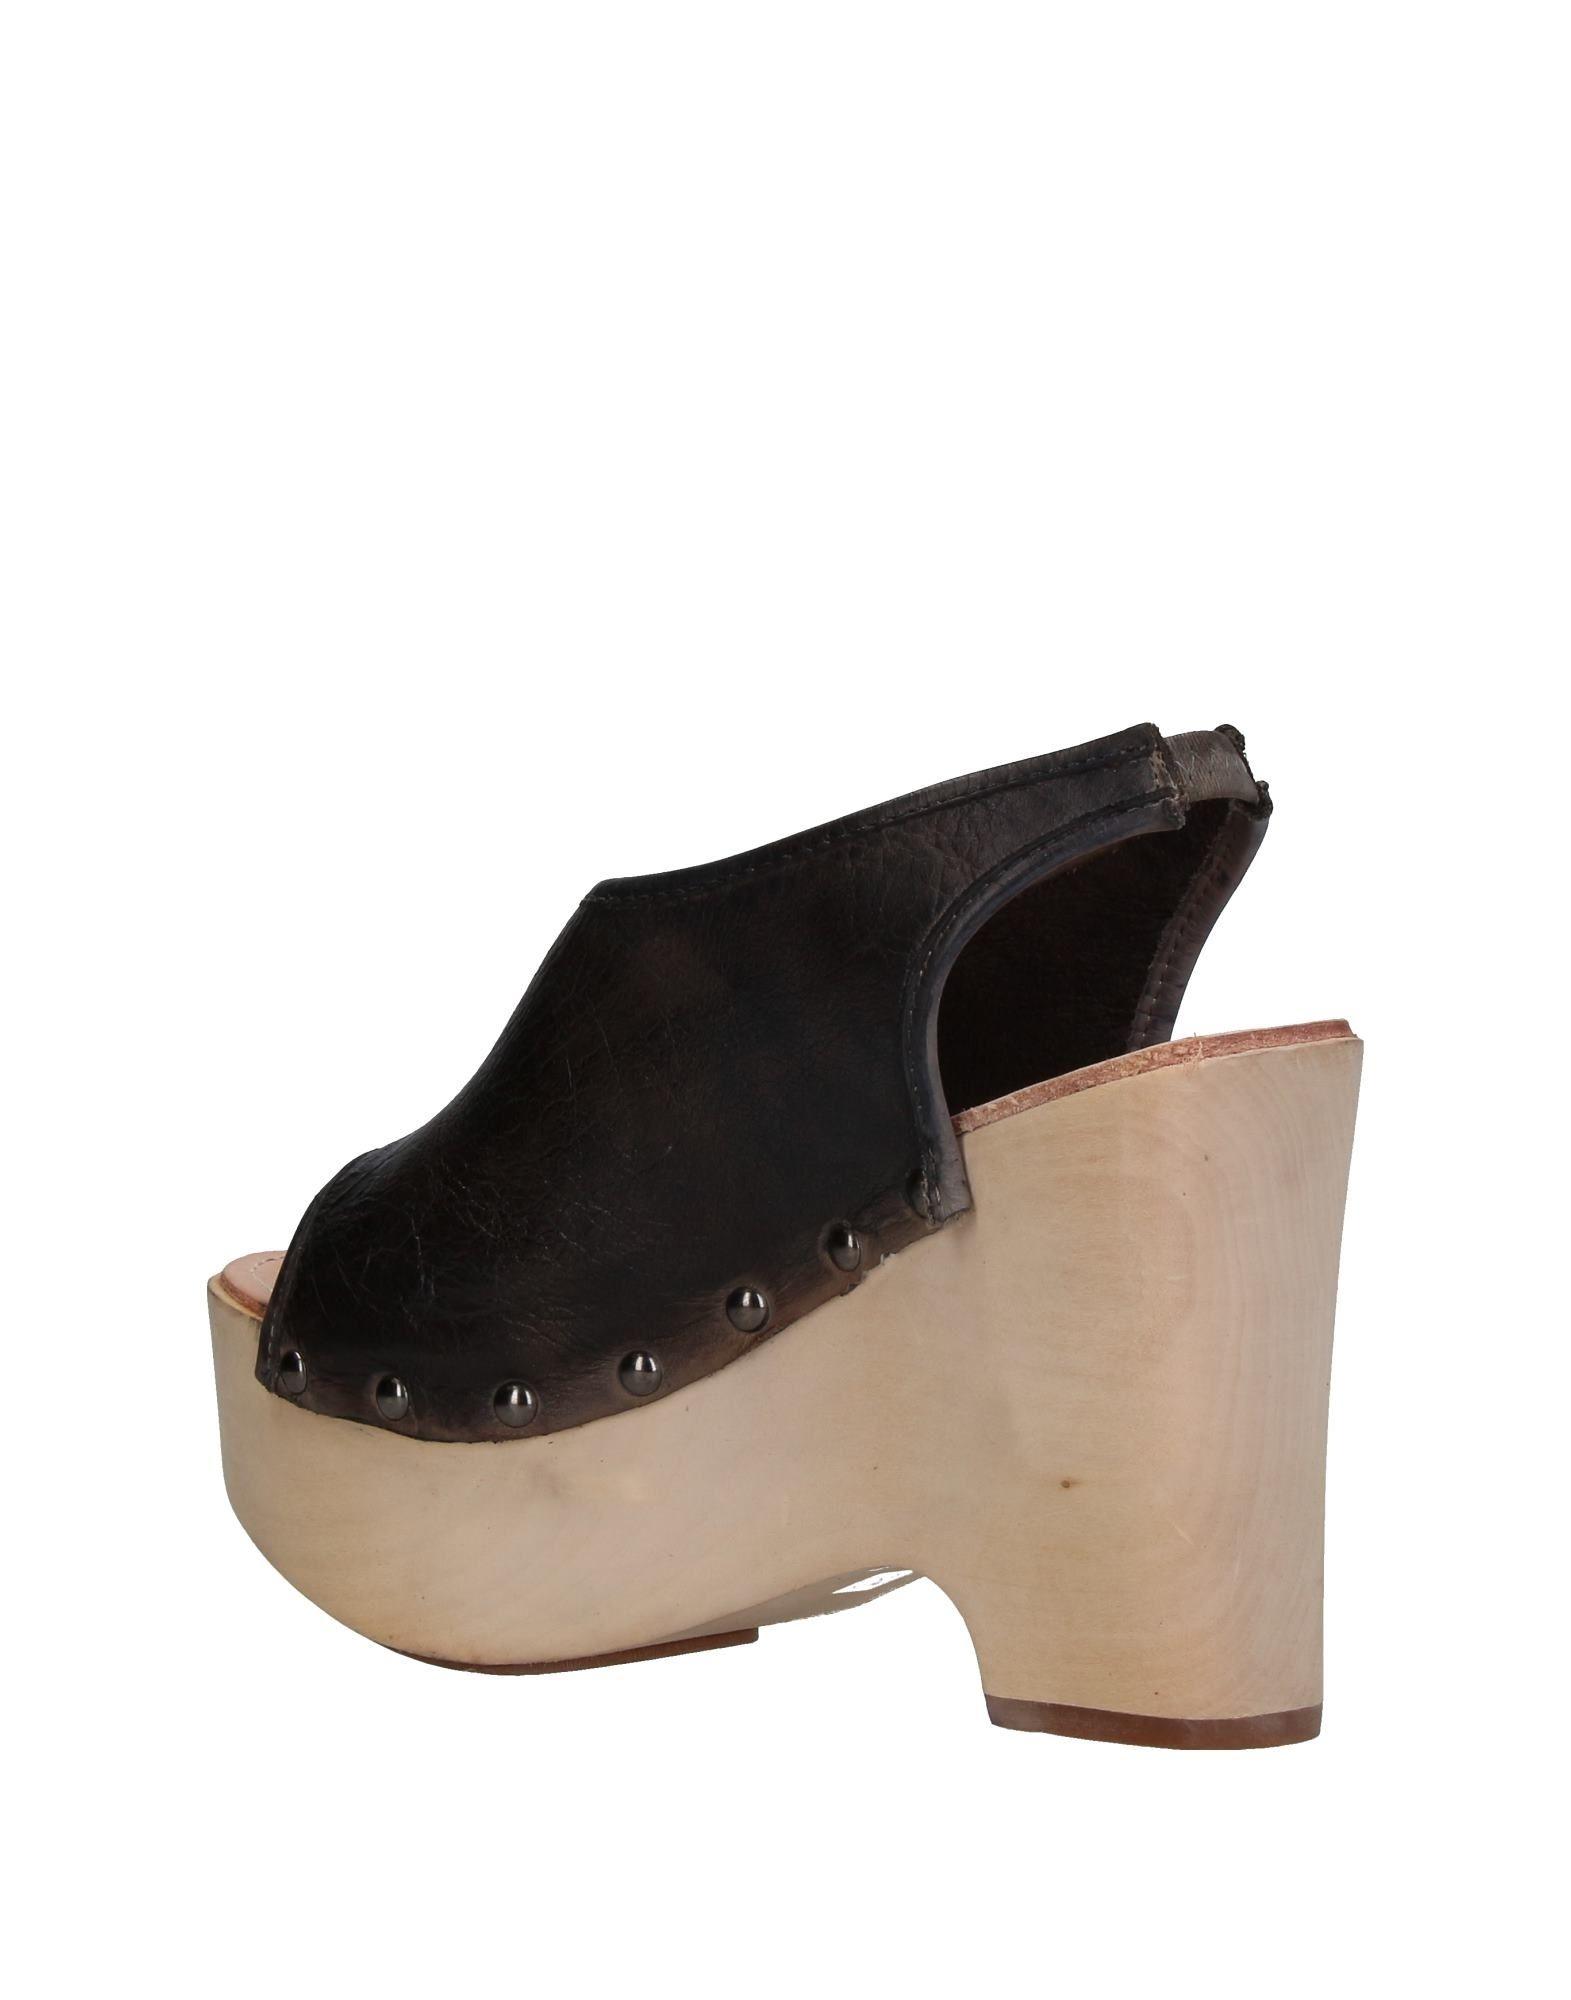 Sandales Baldinini Trend Femme - Sandales Baldinini Trend sur